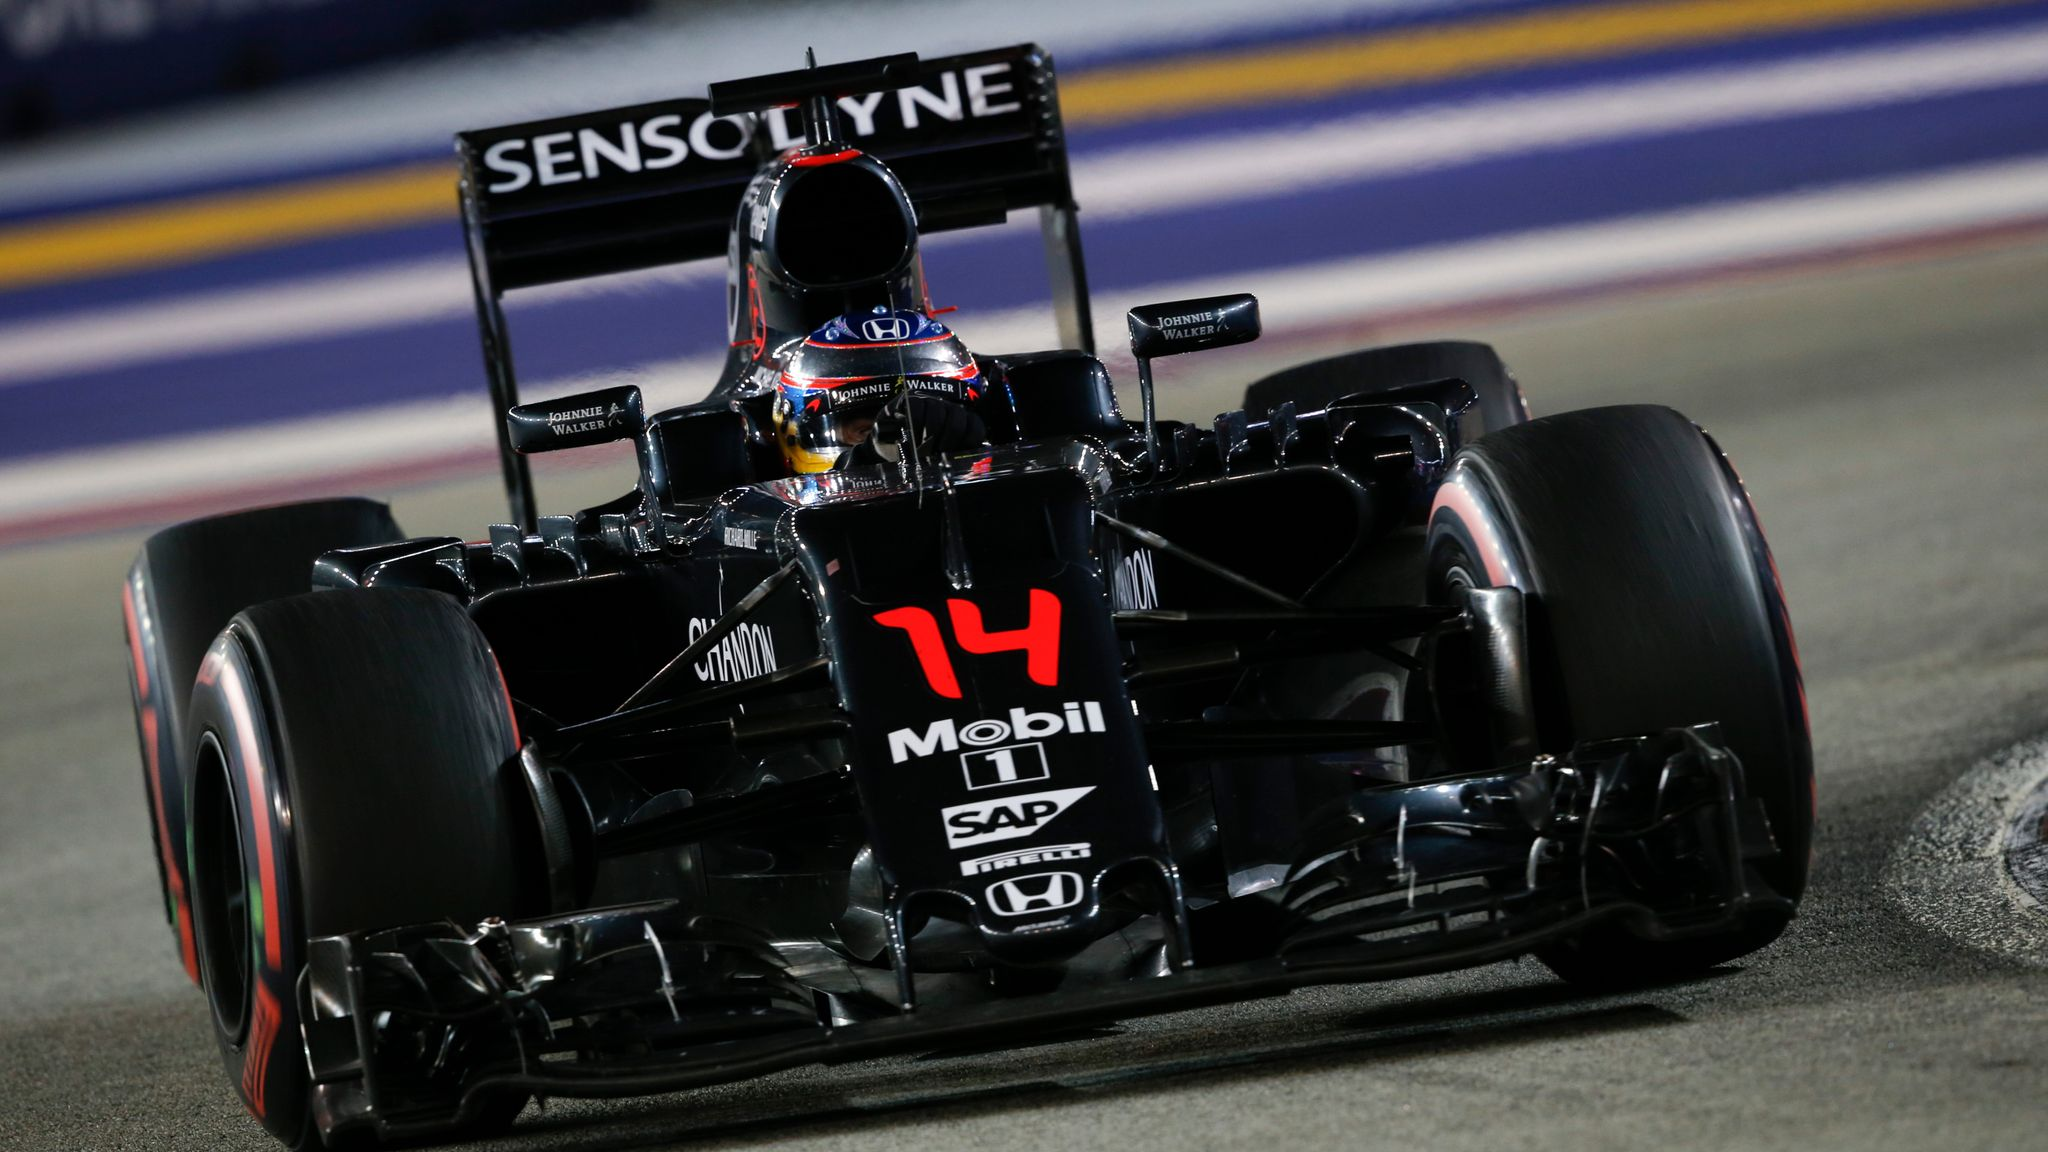 McLaren 'ready to win again' in Formula 1 | F1 News